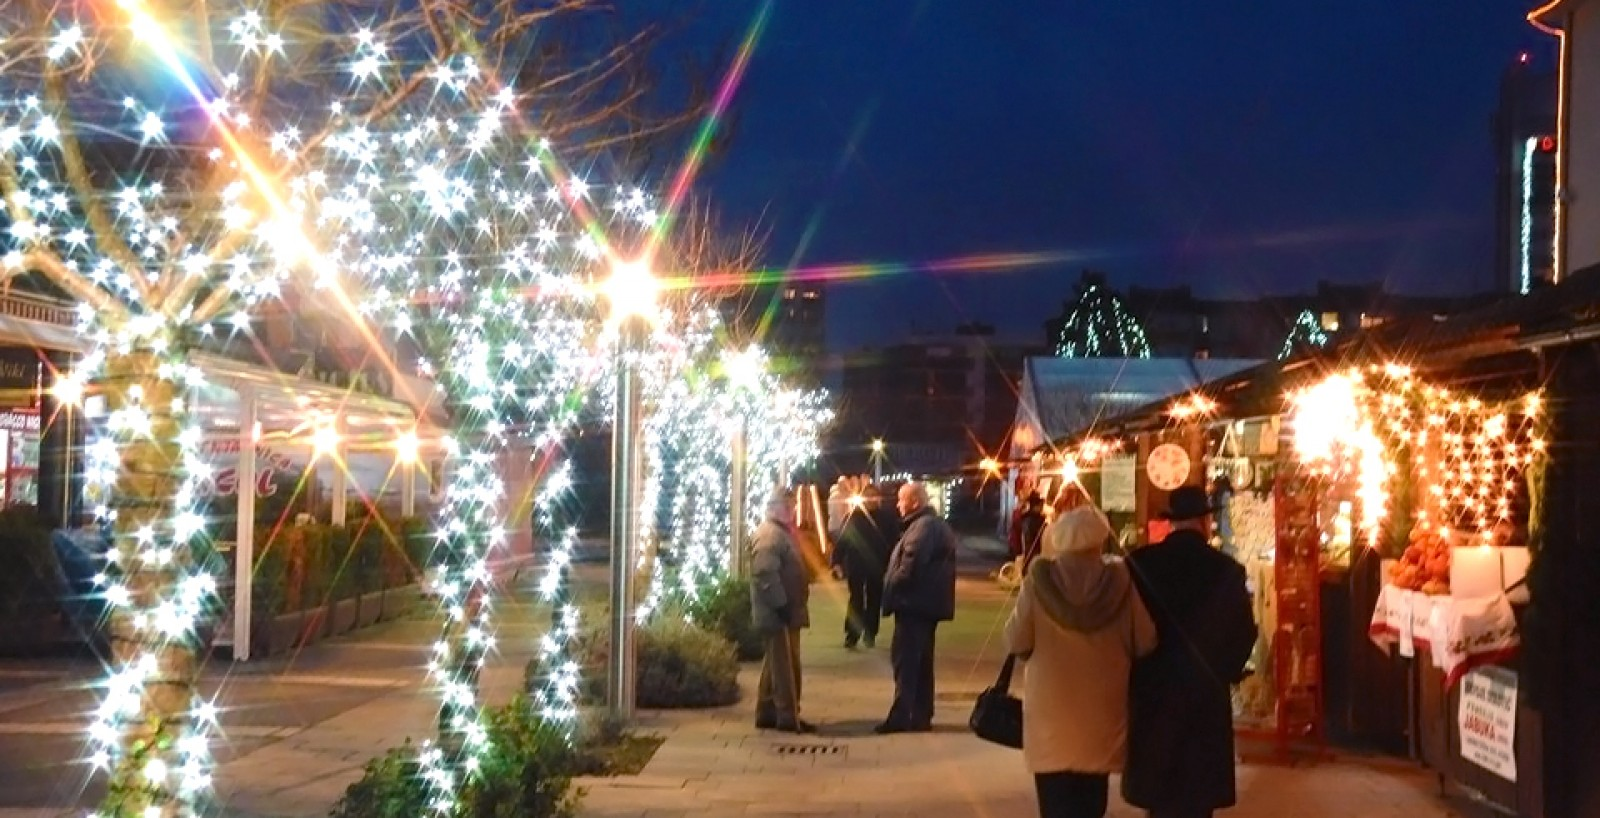 December in Gorica